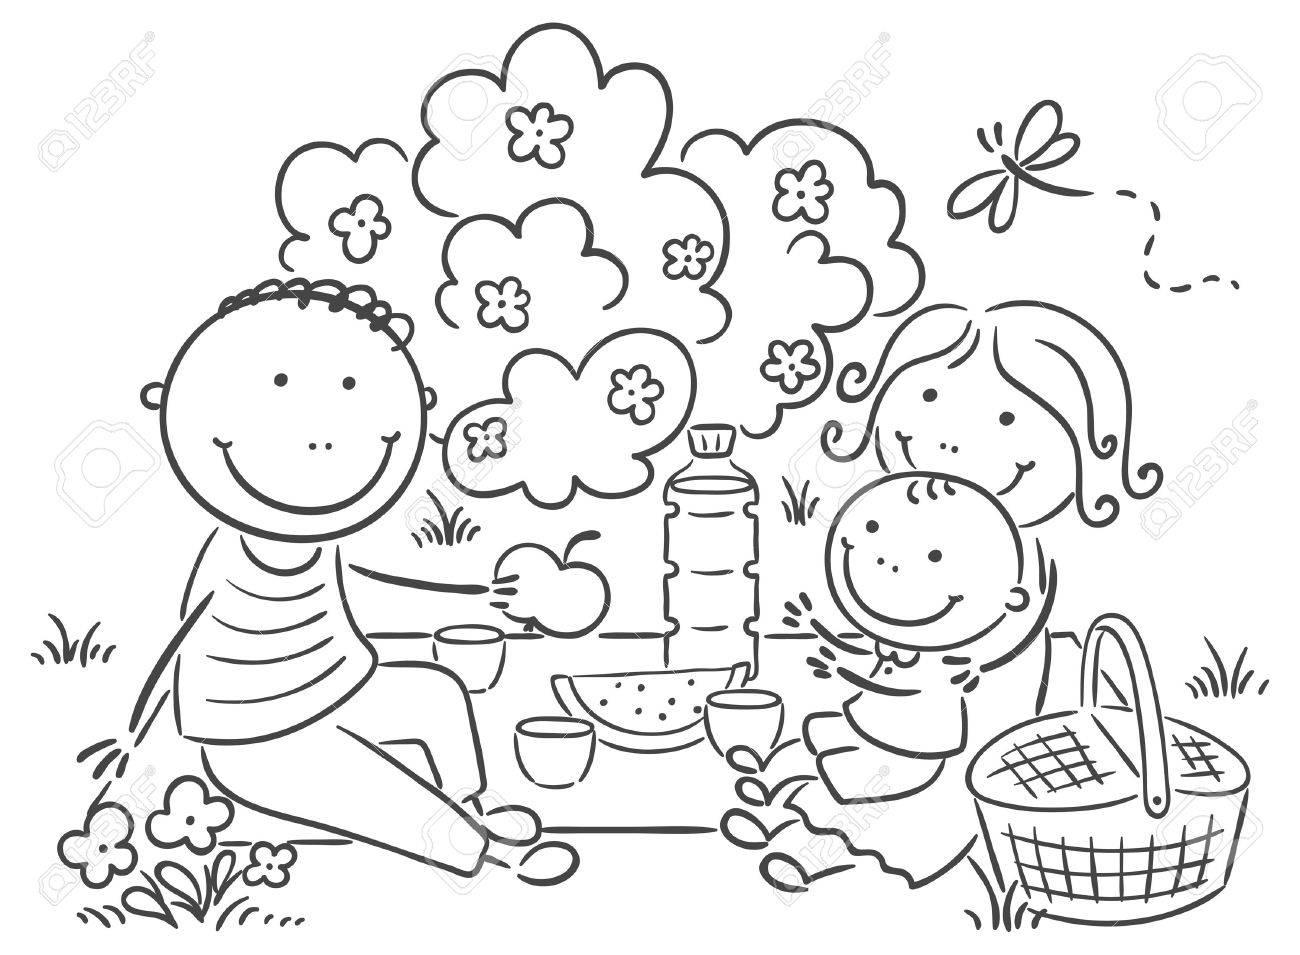 hight resolution of cartoon family having picnic outdoors royalty free cliparts vectors jpg 1300x955 summer family picnic clipart